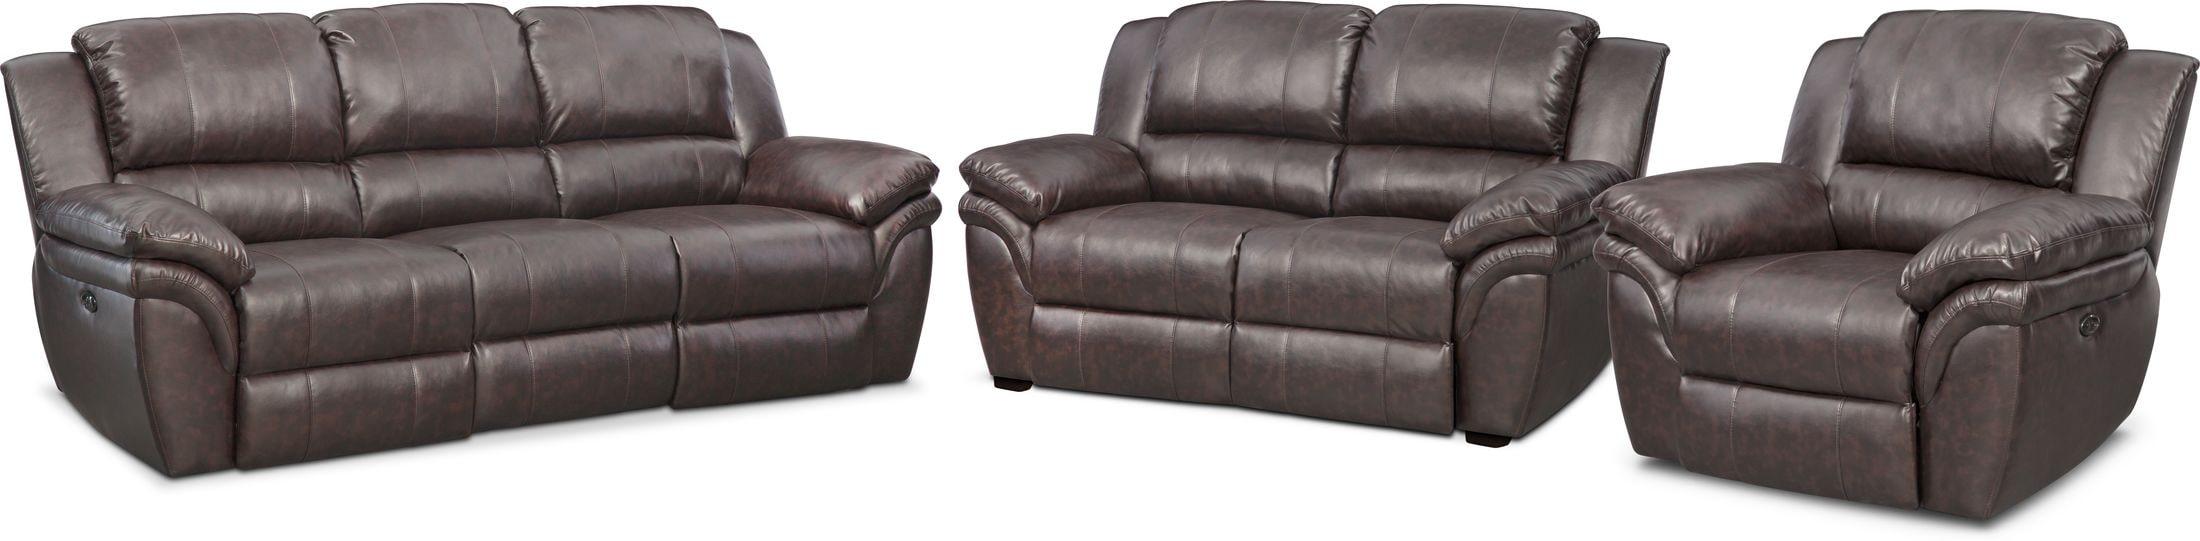 Living Room Furniture - Aldo Power Reclining Sofa, Power Recliner, and Stationary Loveseat